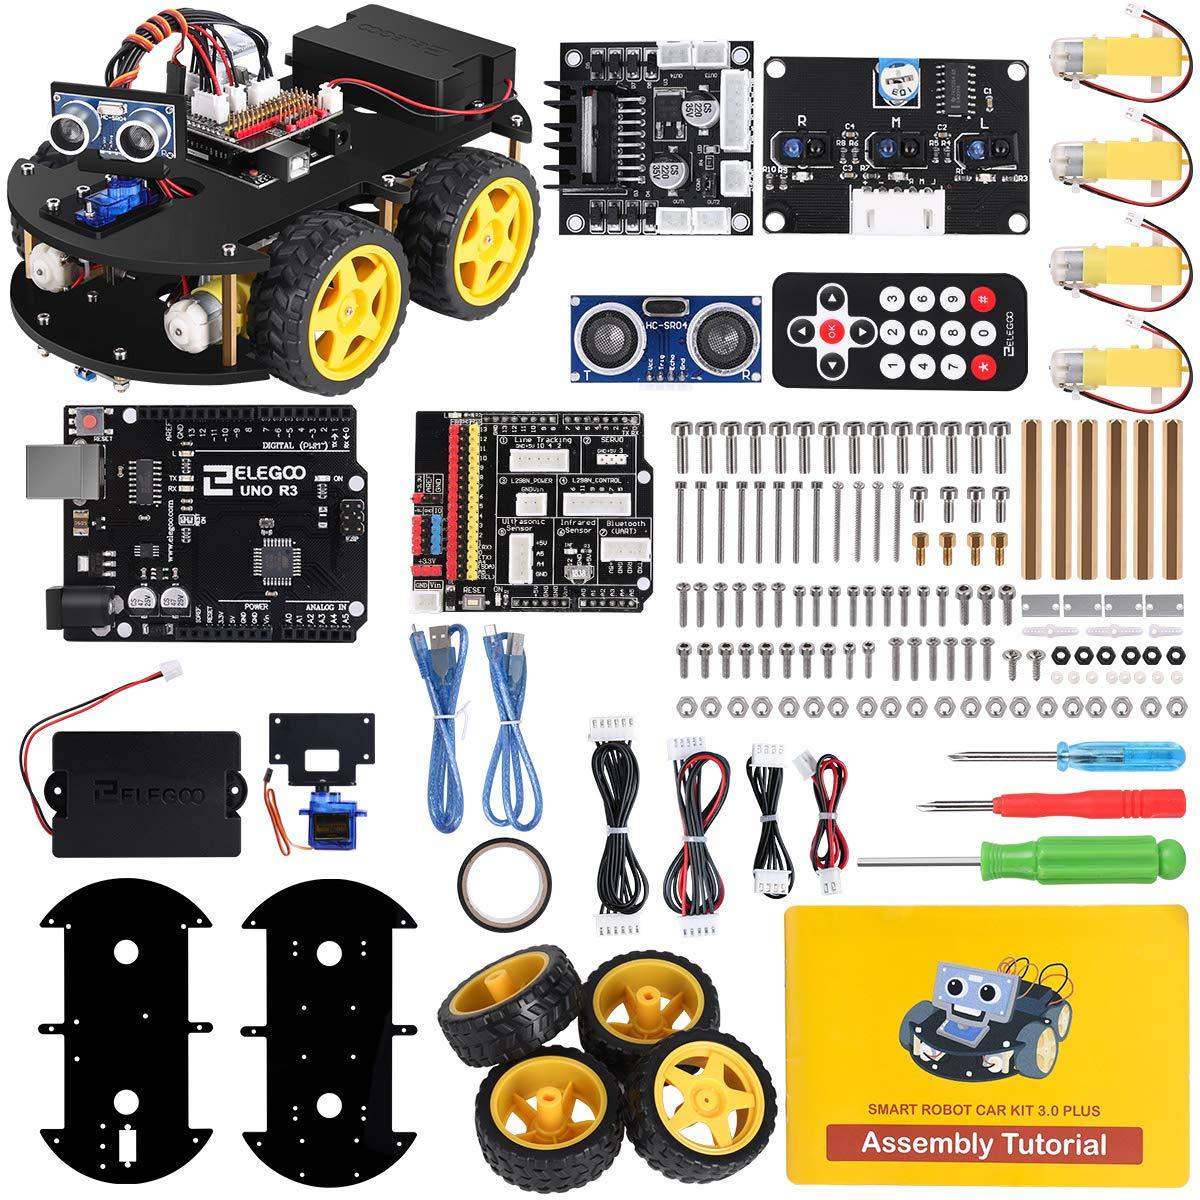 ELEGOO UNO R3 Kit de Coche Robot Inteligente V3.0 Plus Compatible con Arduino IDE